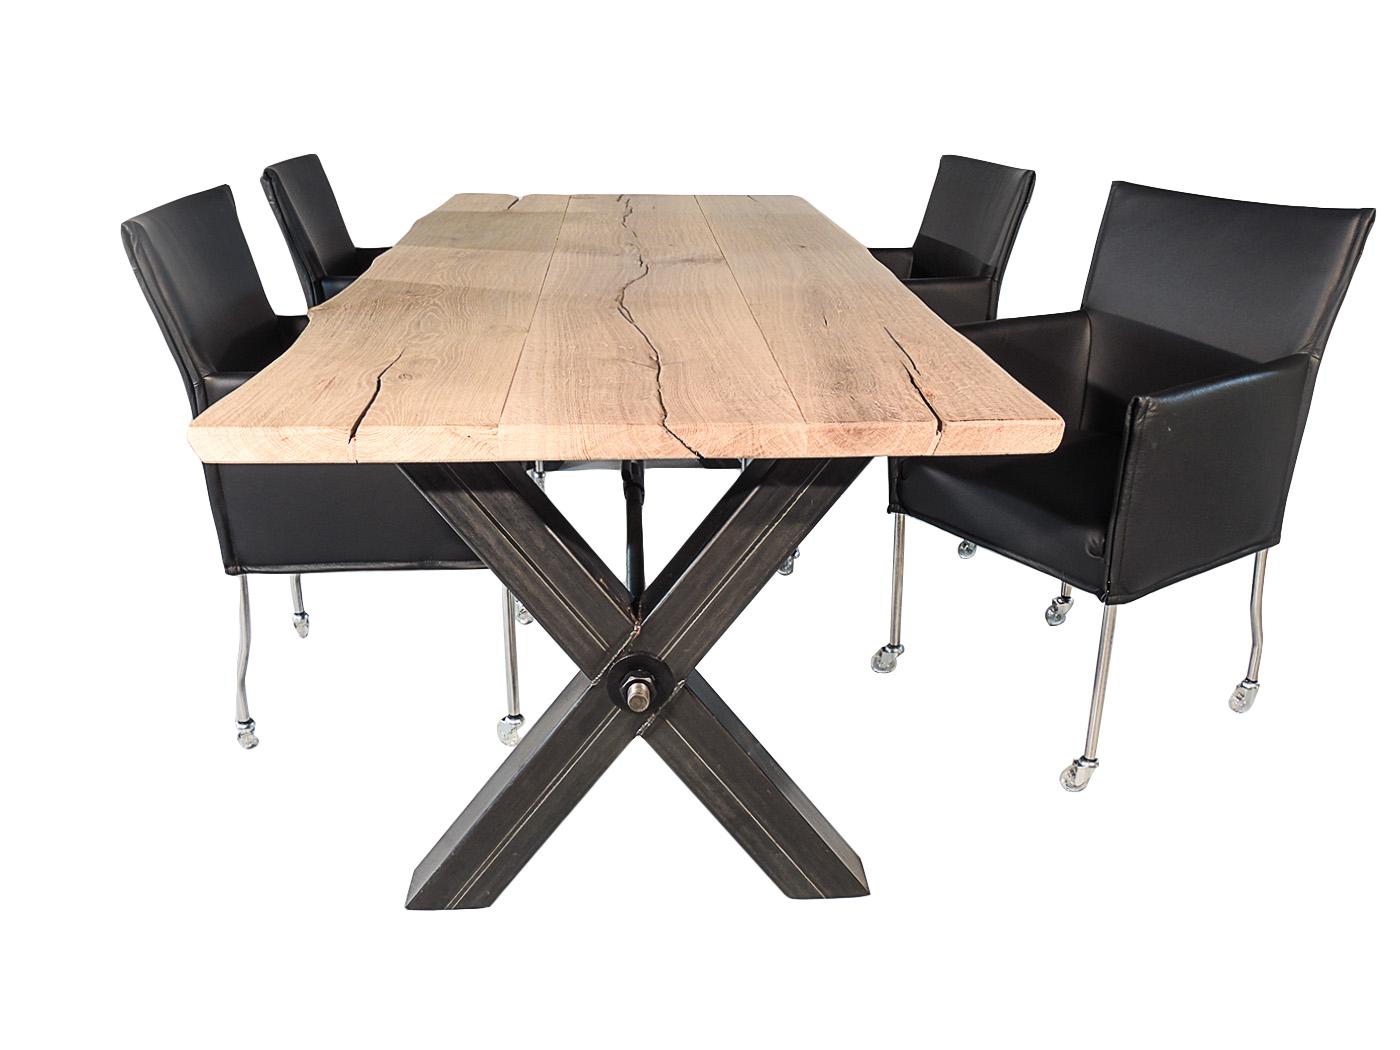 Detroit - Boomstam tafel